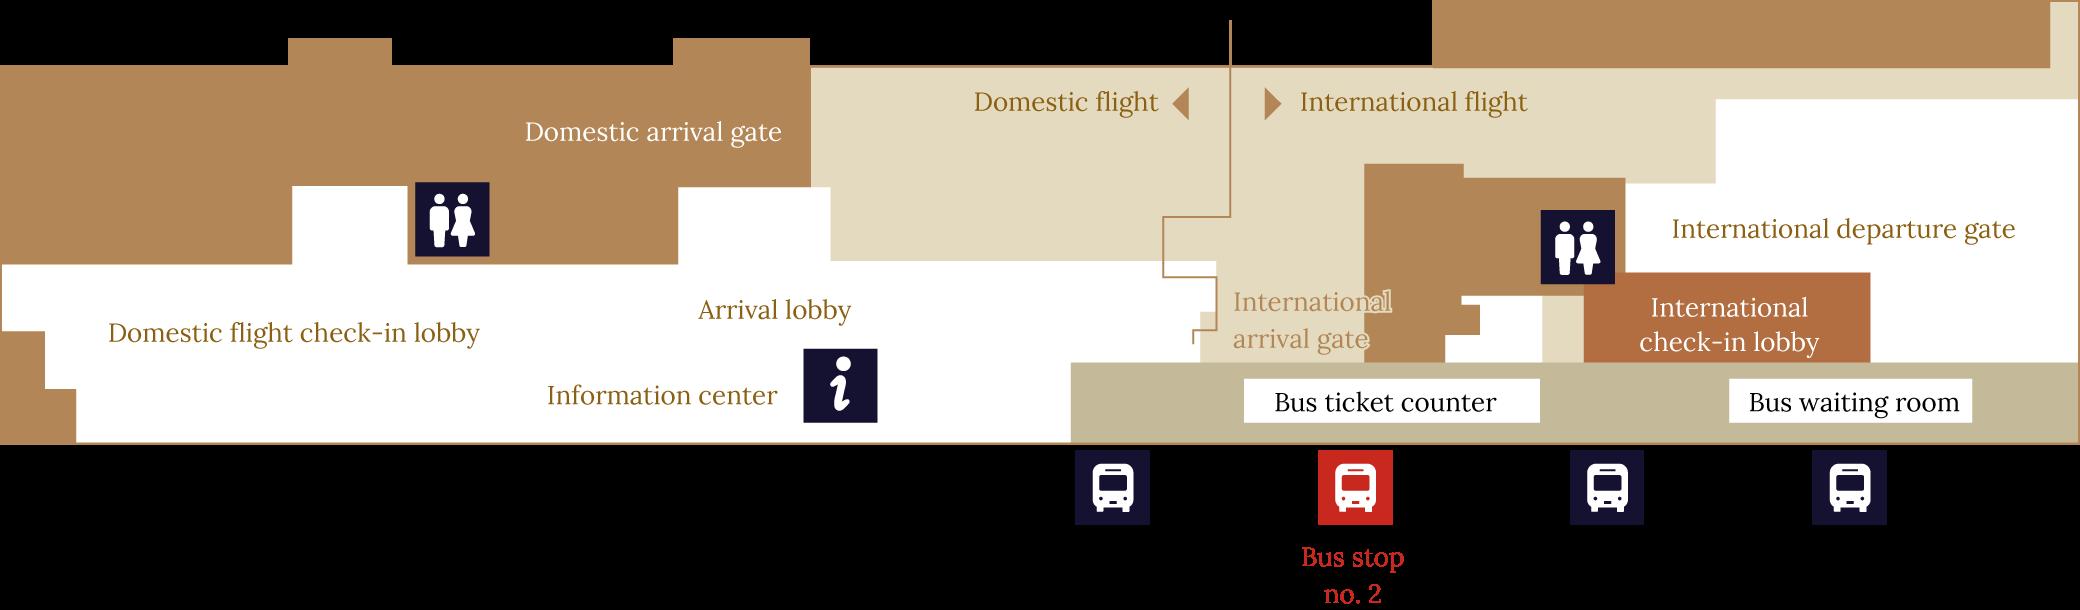 Oita Airport information